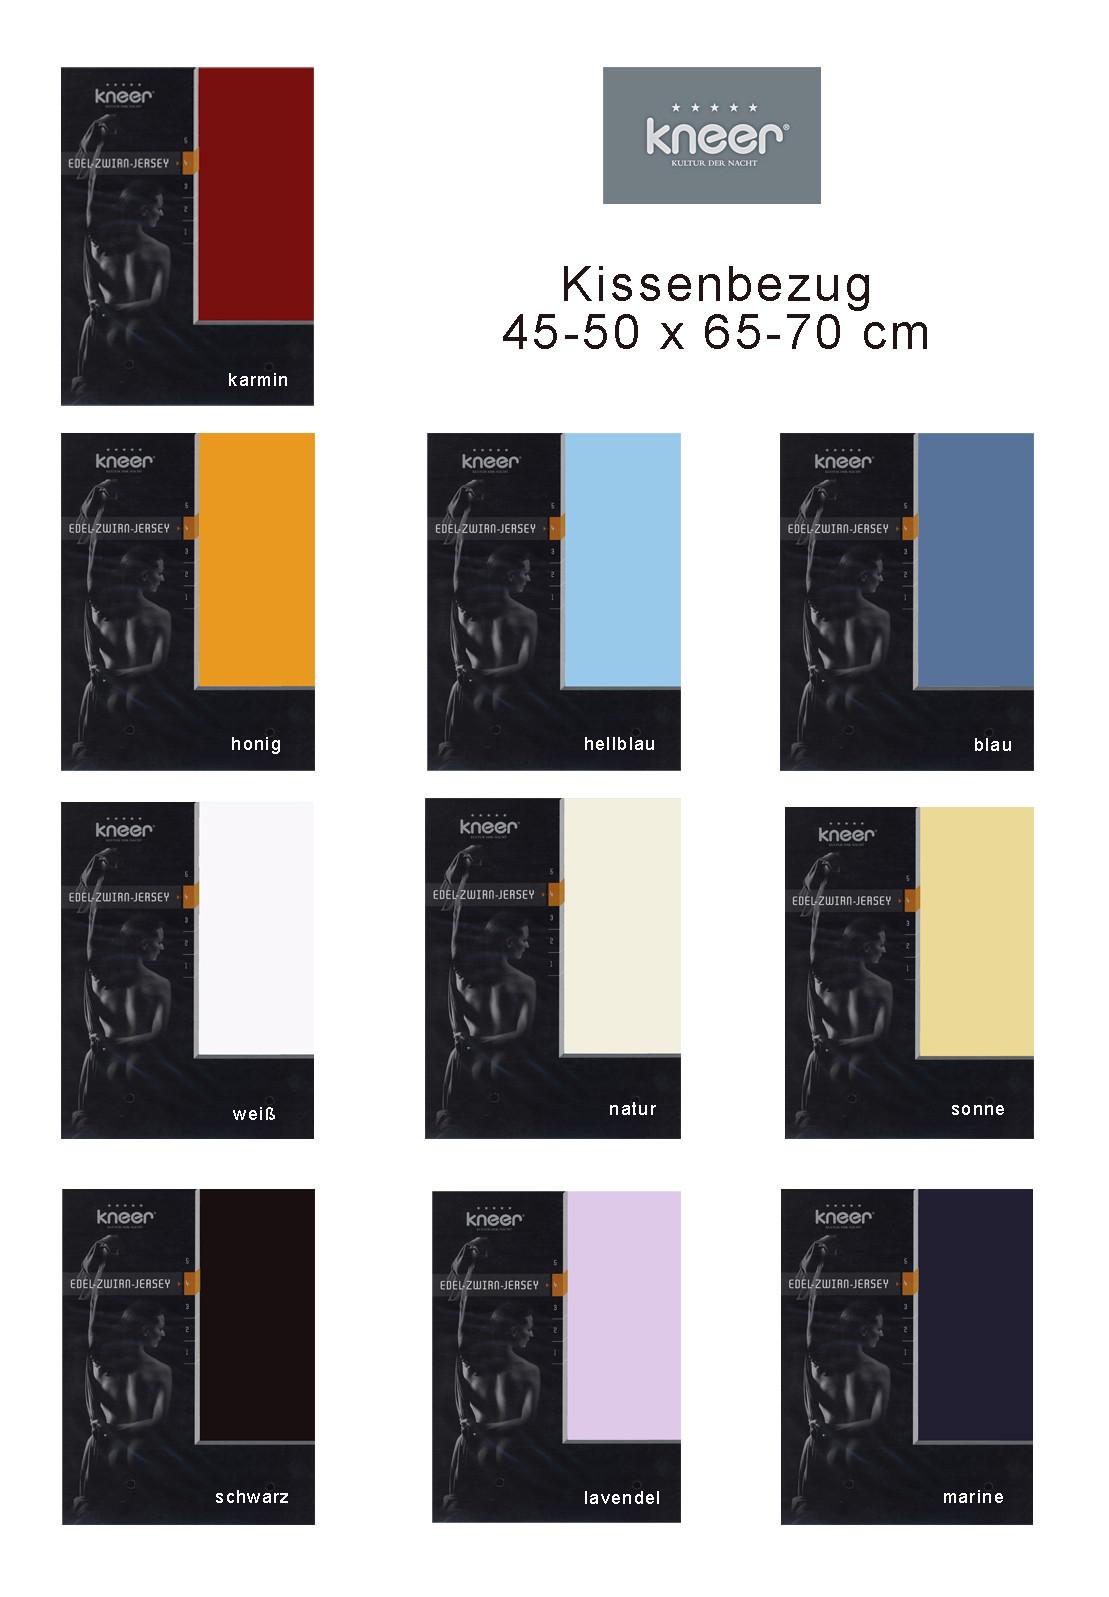 Kneer Mako Zwirn Jersey Kissenbezug 50x70 cm in 11 Farben